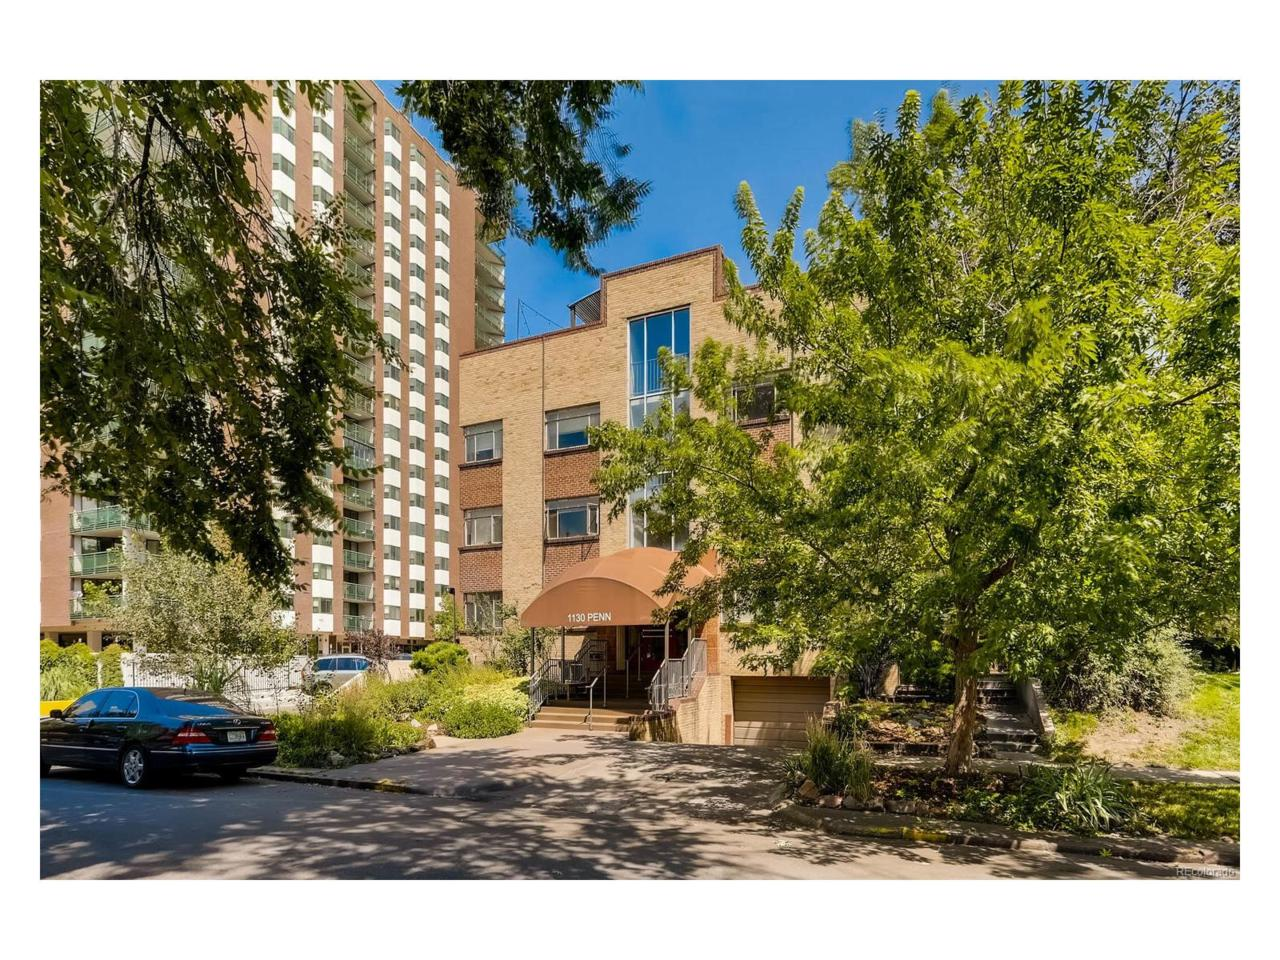 1130 N Pennsylvania Street #308, Denver, CO 80203 (MLS #7273214) :: 8z Real Estate